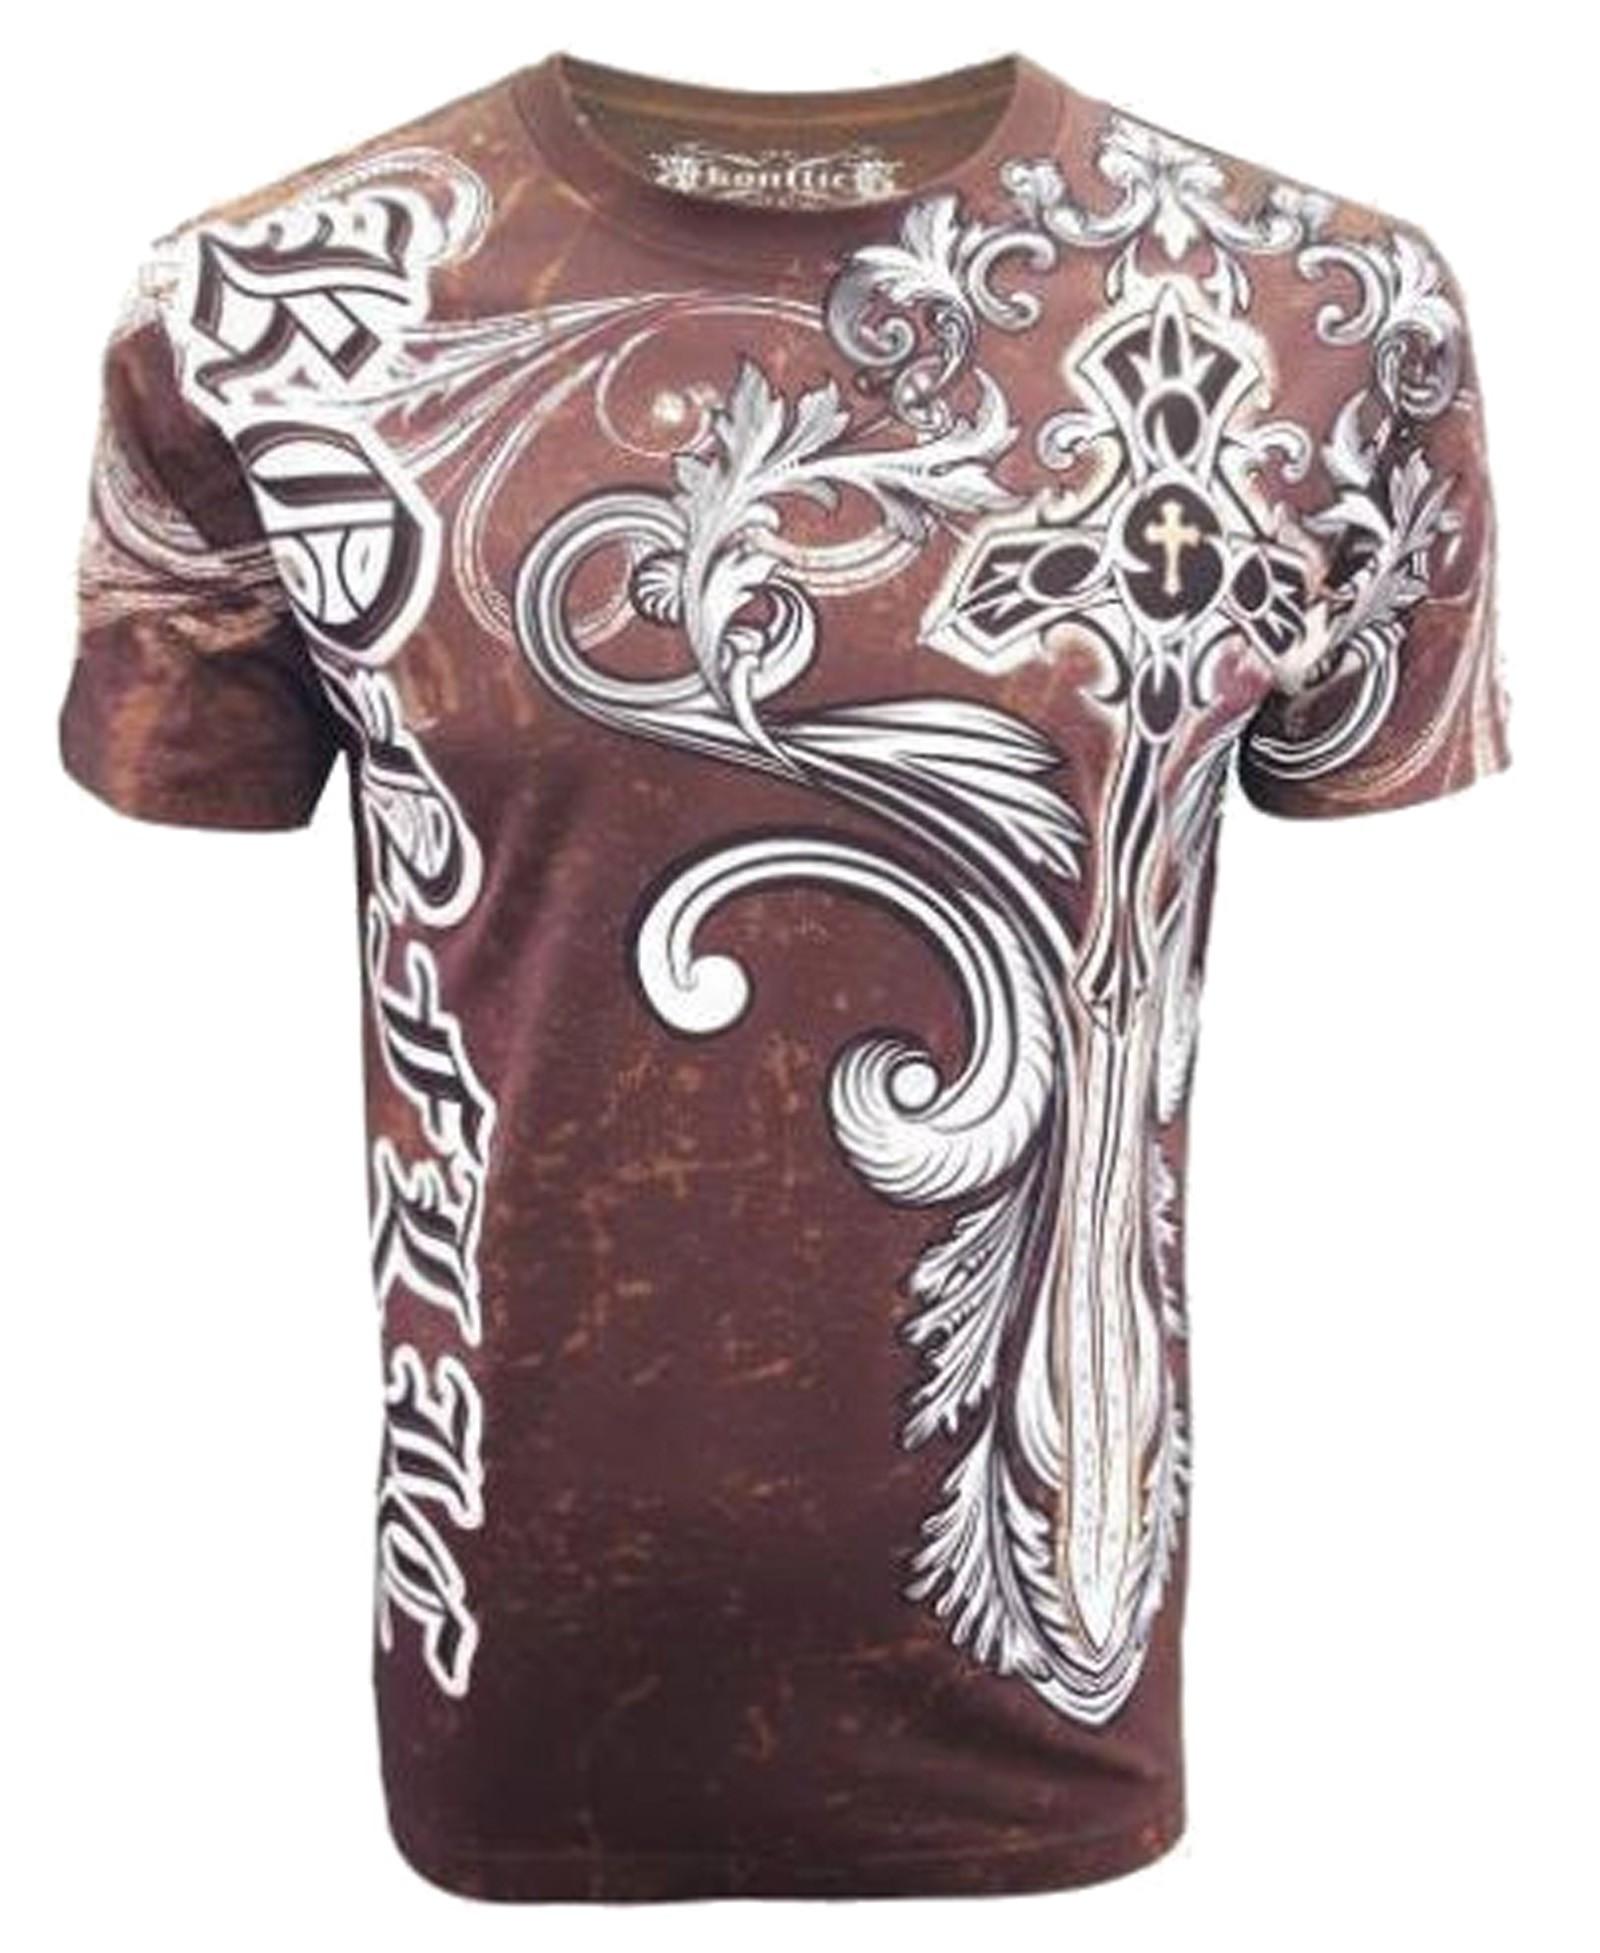 Konflic Clothing - La Santa Cruz T-Shirt Front